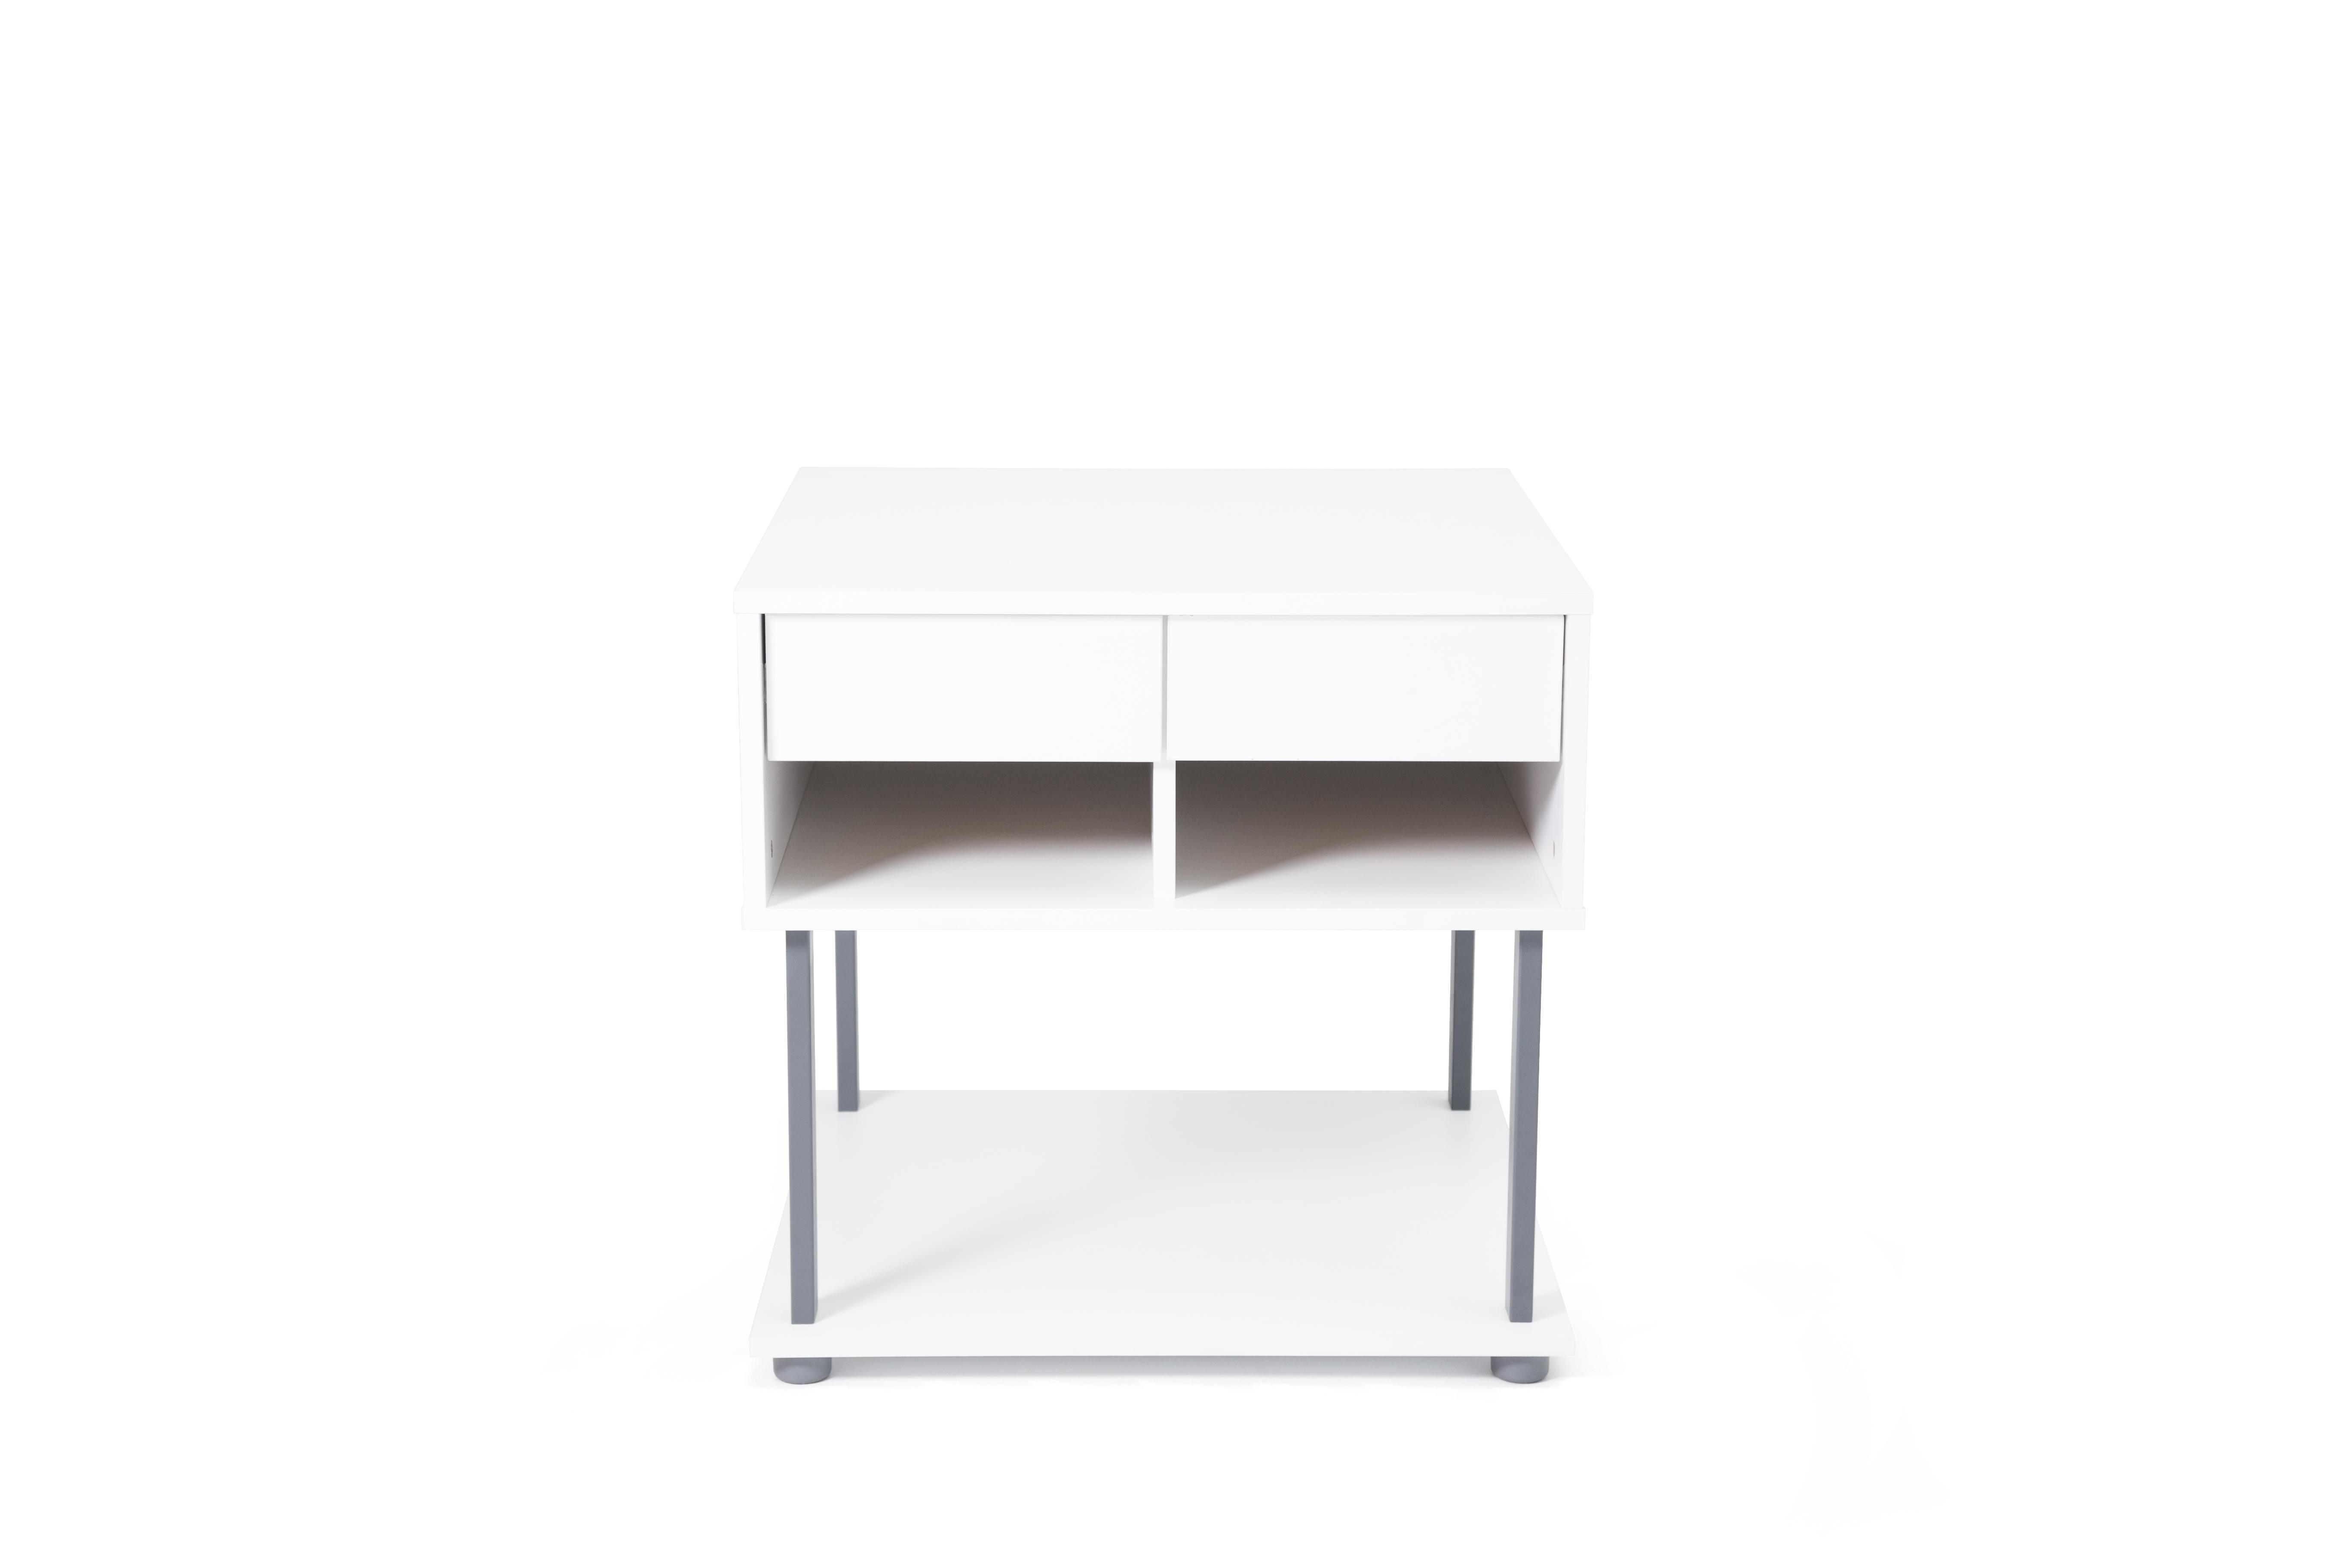 Ovali Büro Kommode 2-türig Ece Weiß Grau